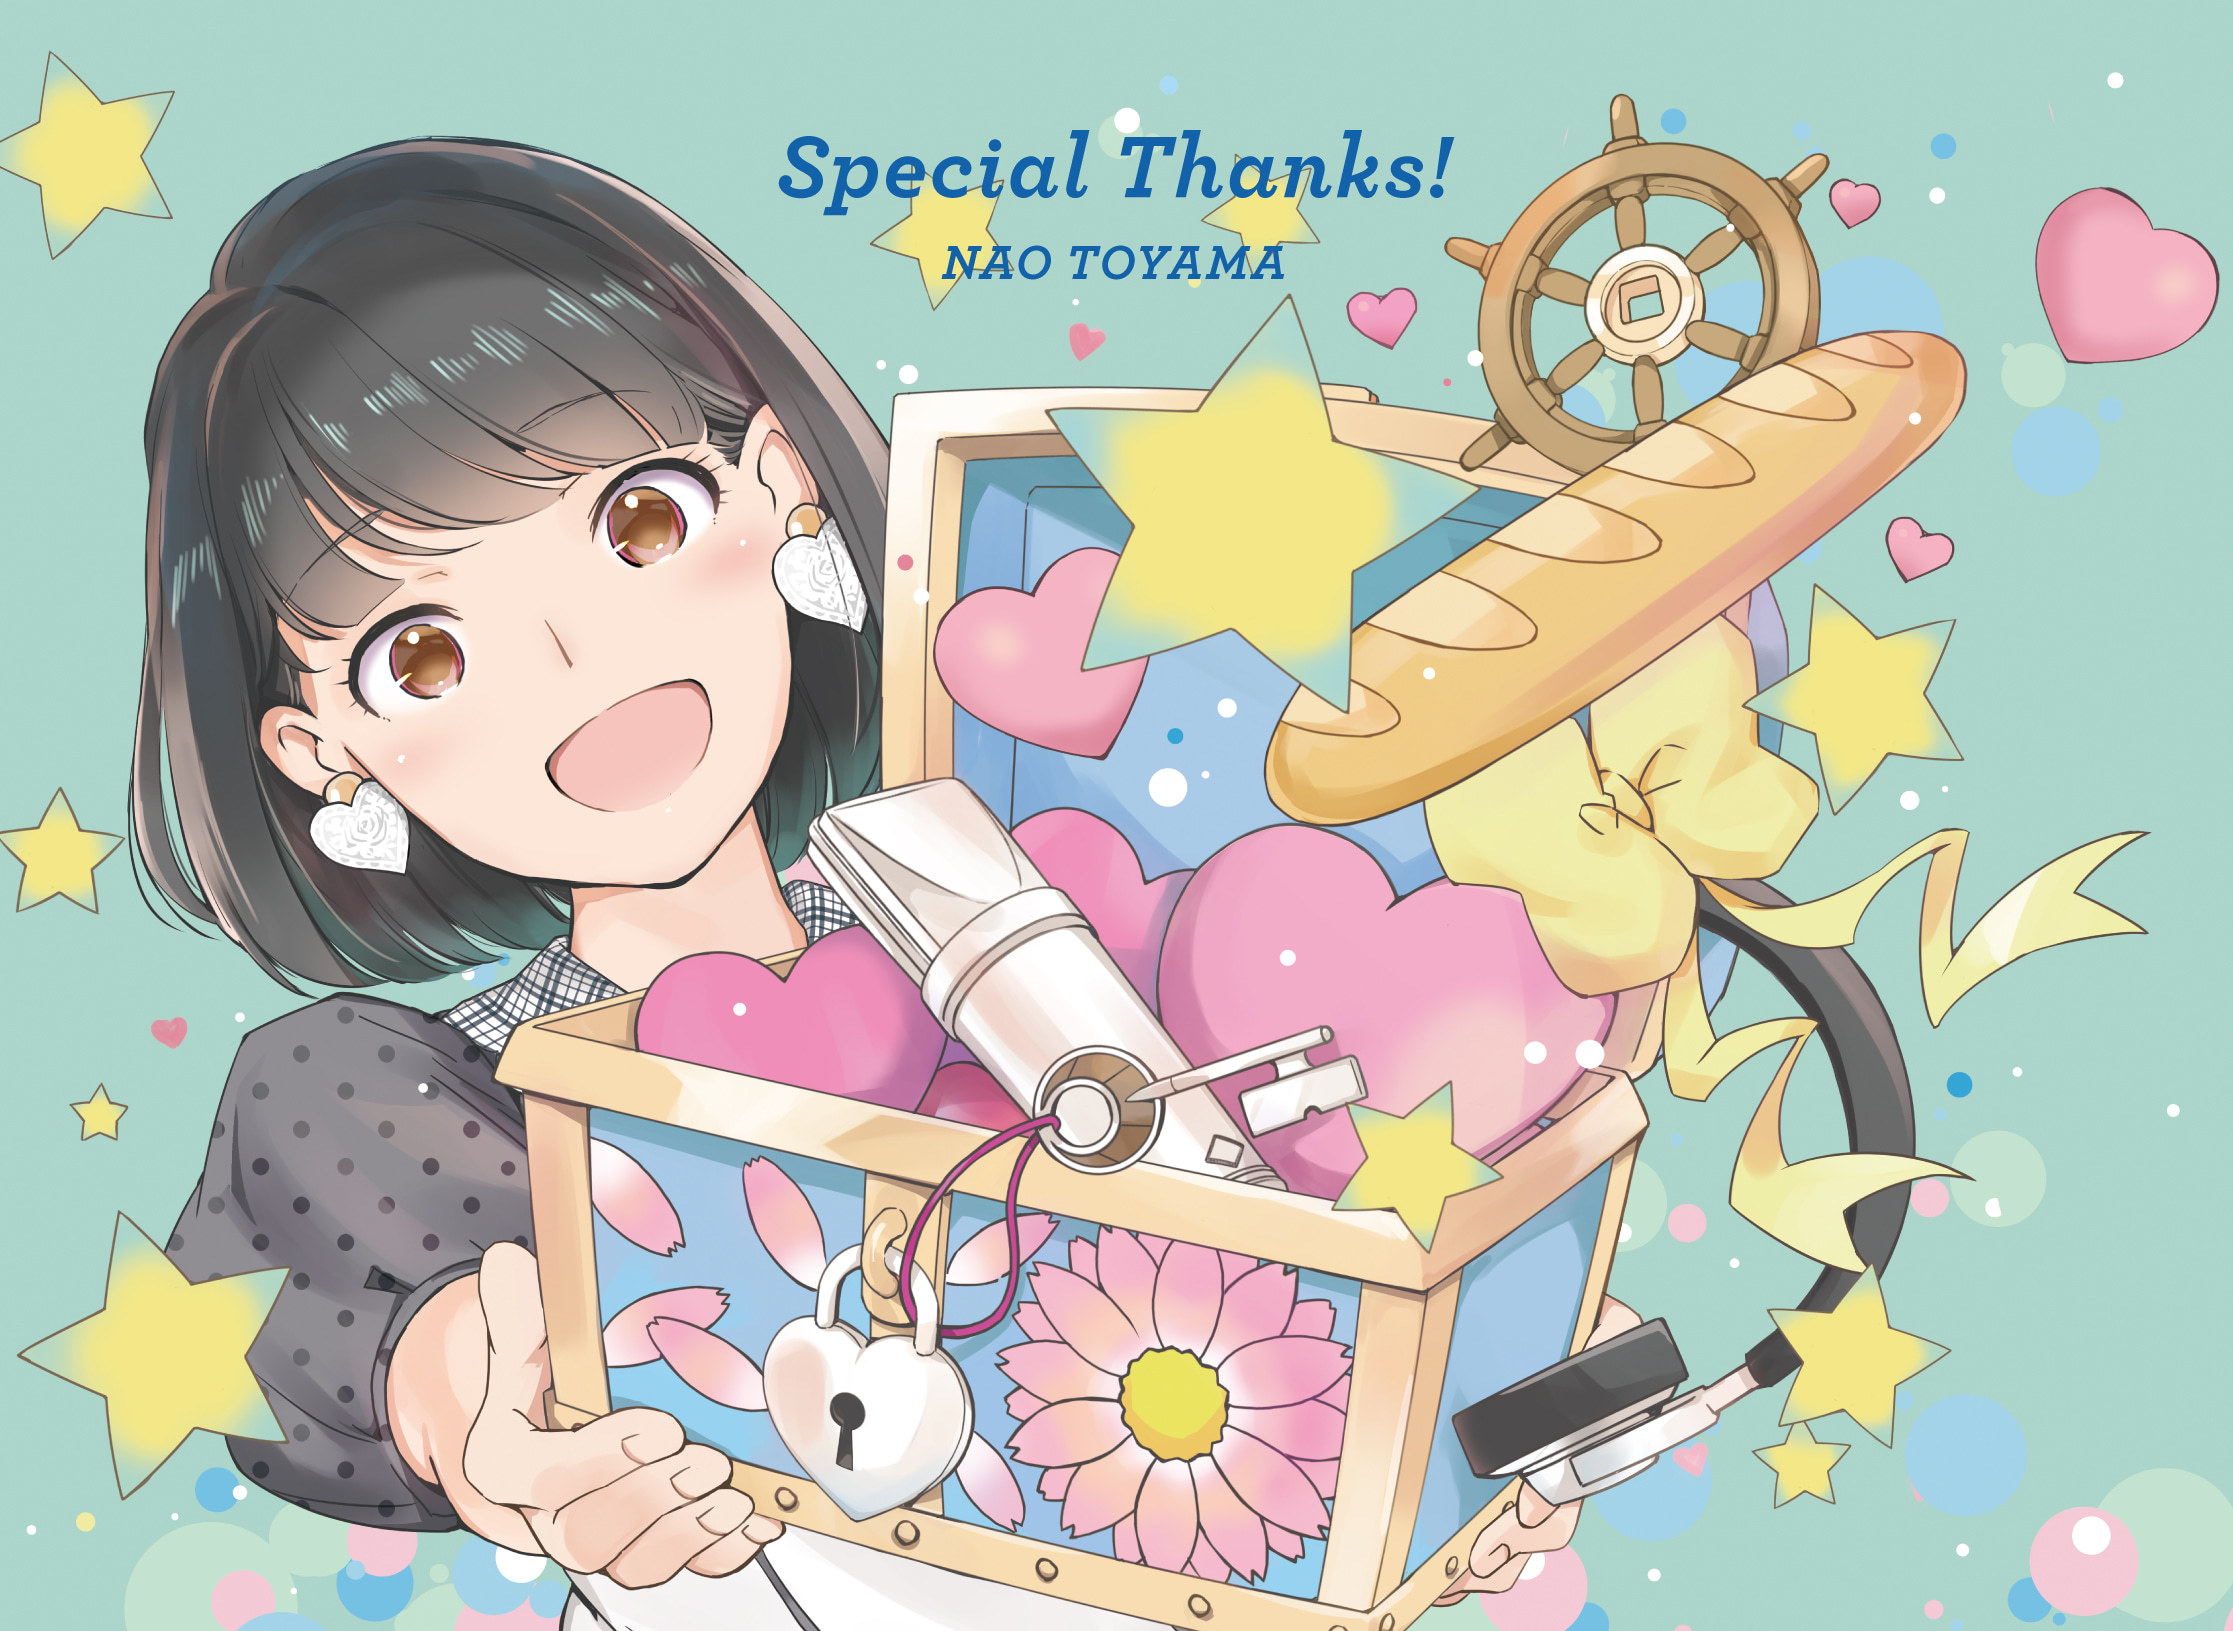 「Special Thanks!」アニバーサリースペシャル盤ジャケット